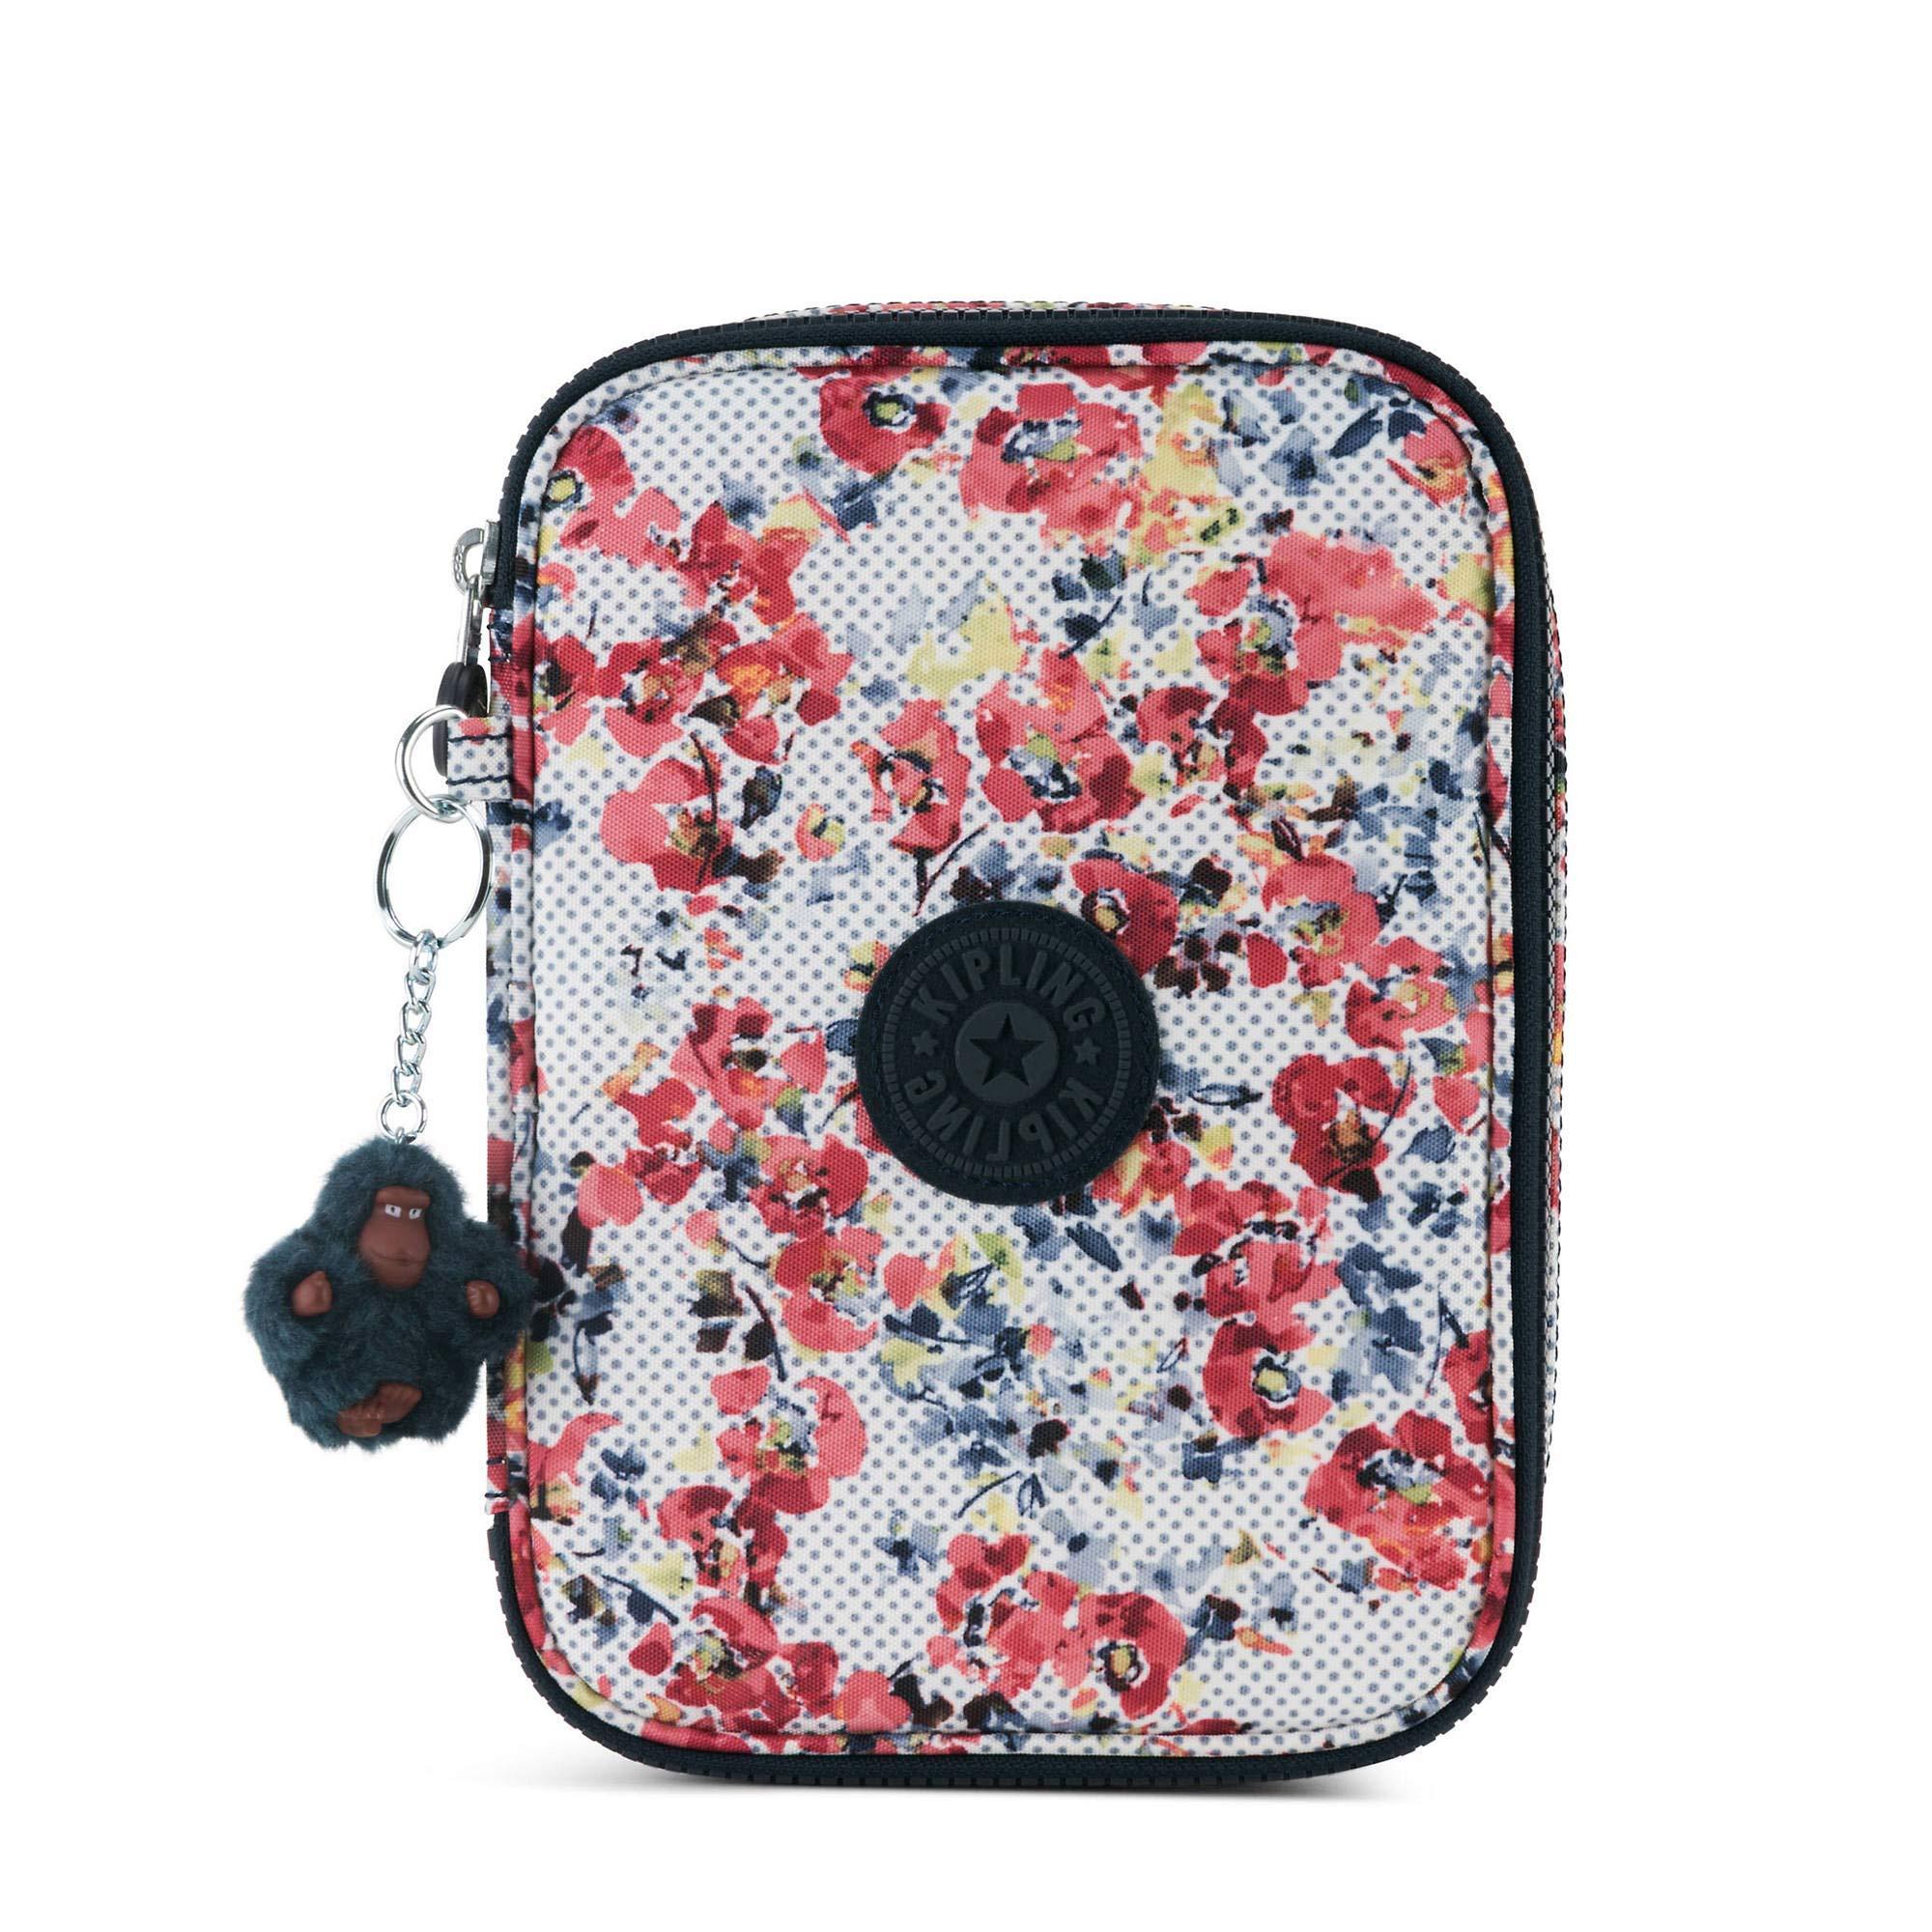 Kipling 100 Pens Pencil Case (Busy Blossoms)